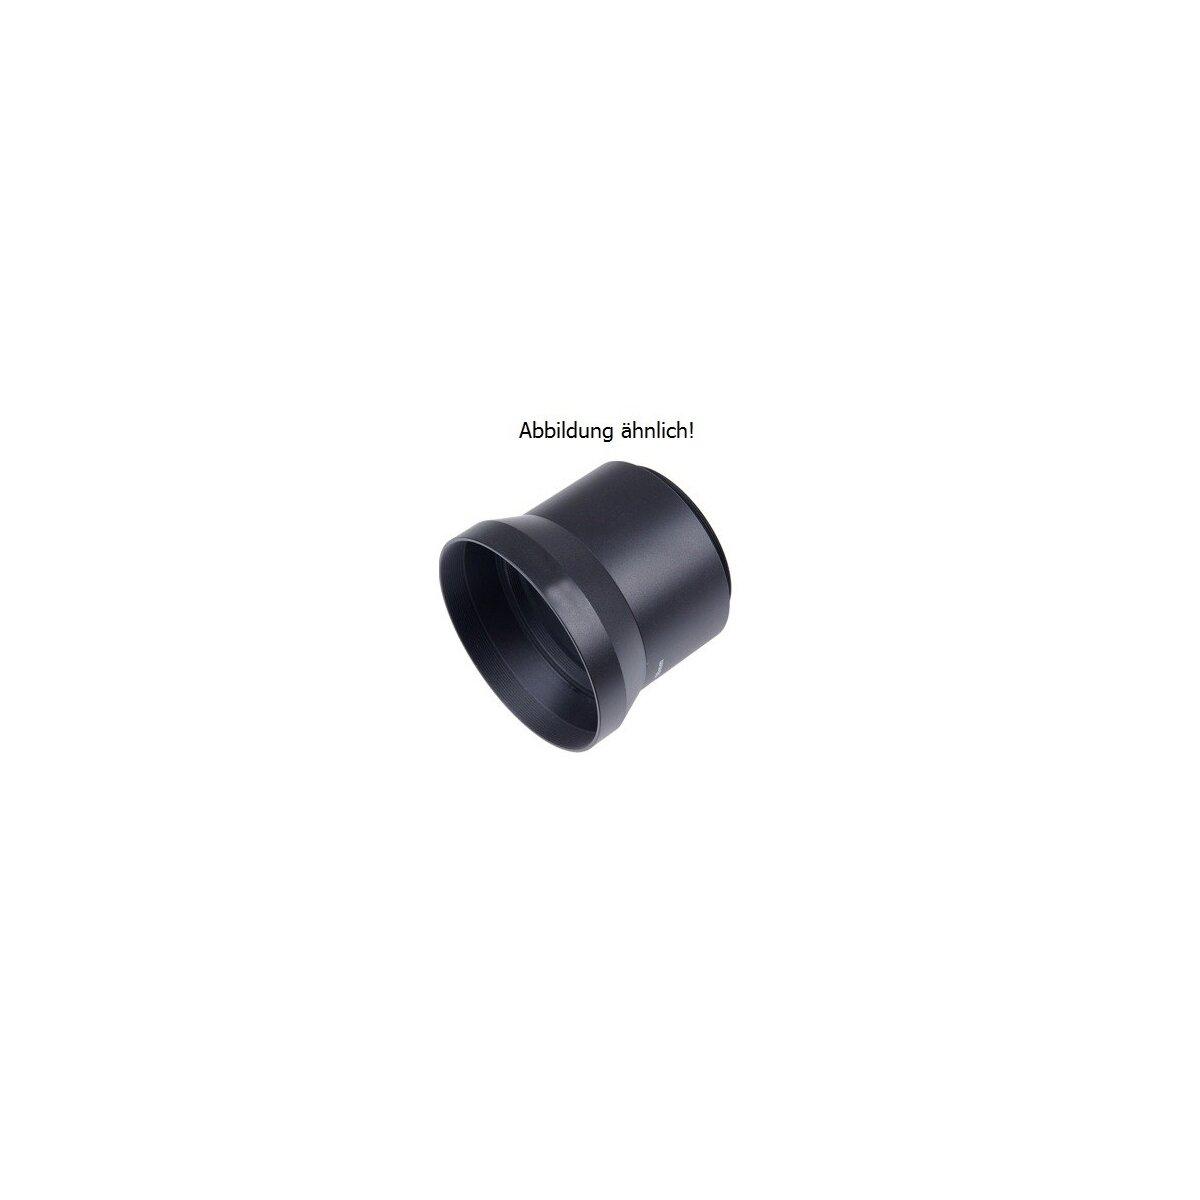 Adapter Tubus fuer Kodak Z700 mit 52mm